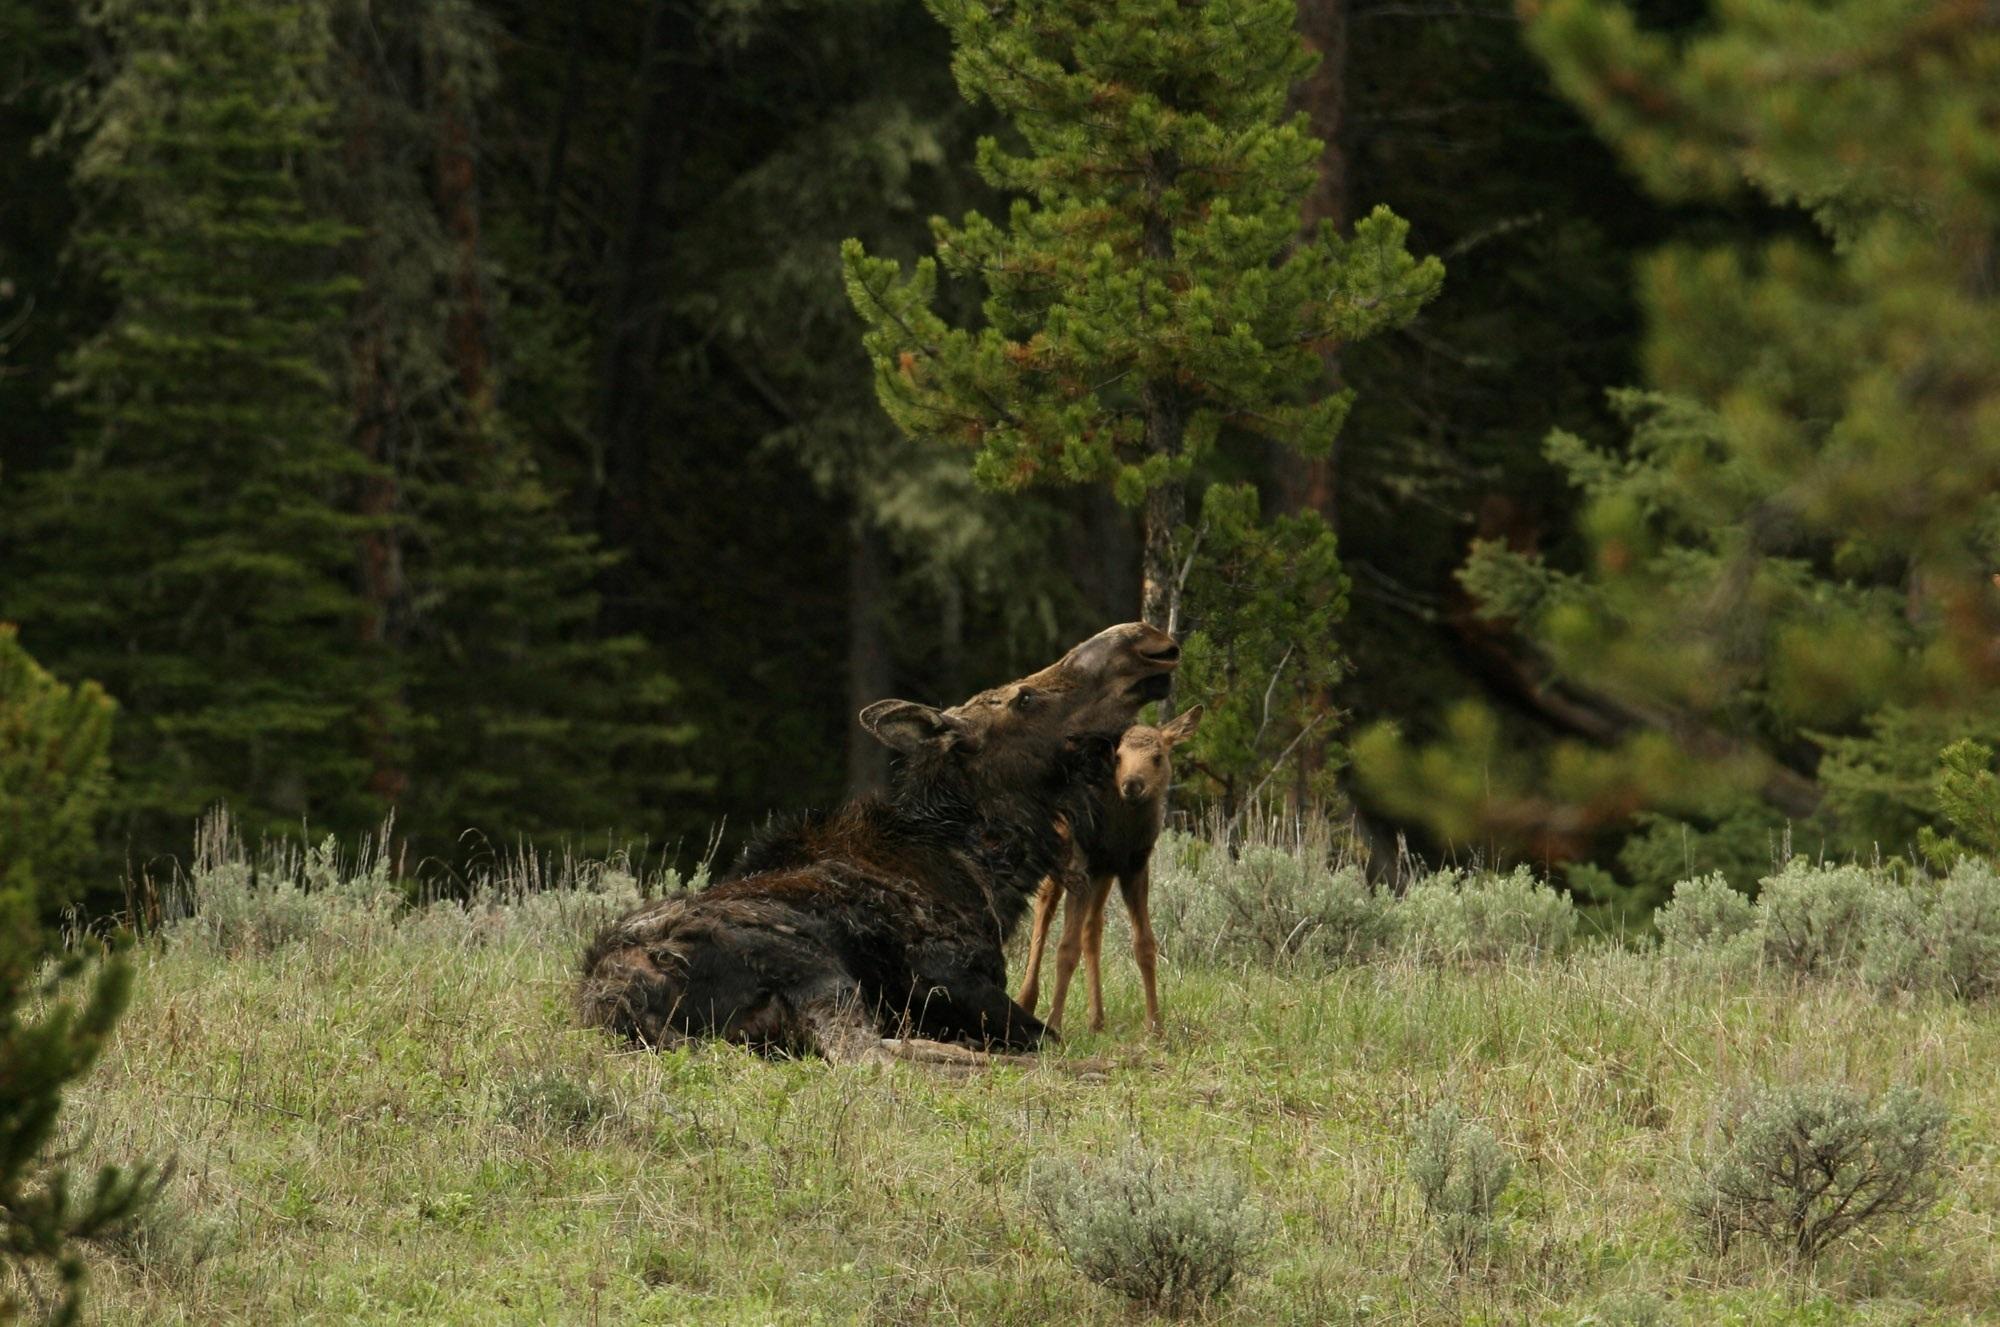 Wild Moose, Animal, Jungle, Moose, Nature, HQ Photo